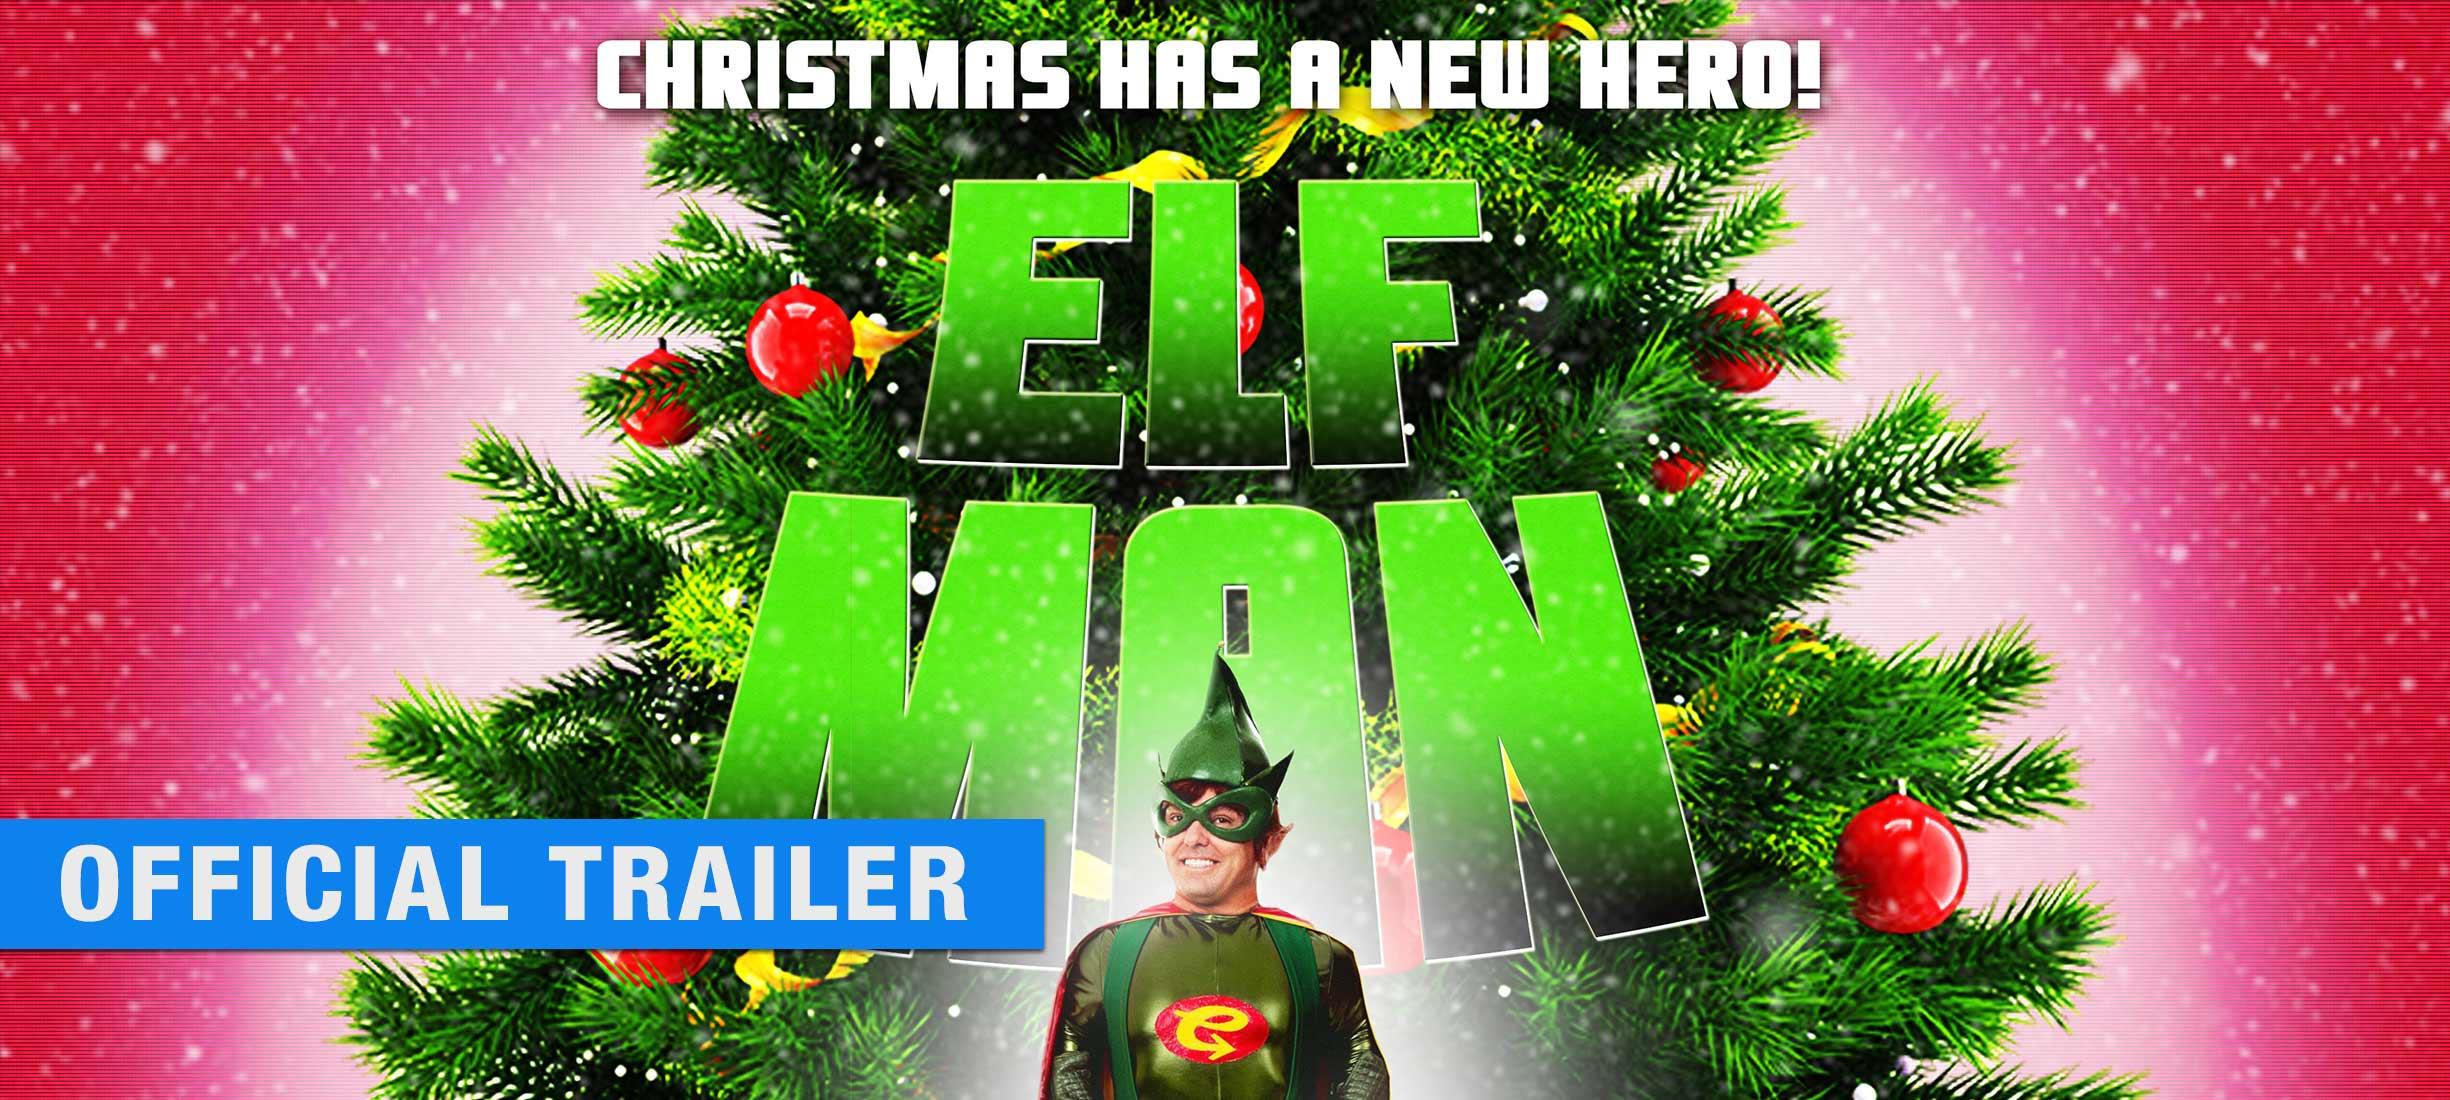 Elf-Man - Official Trailer